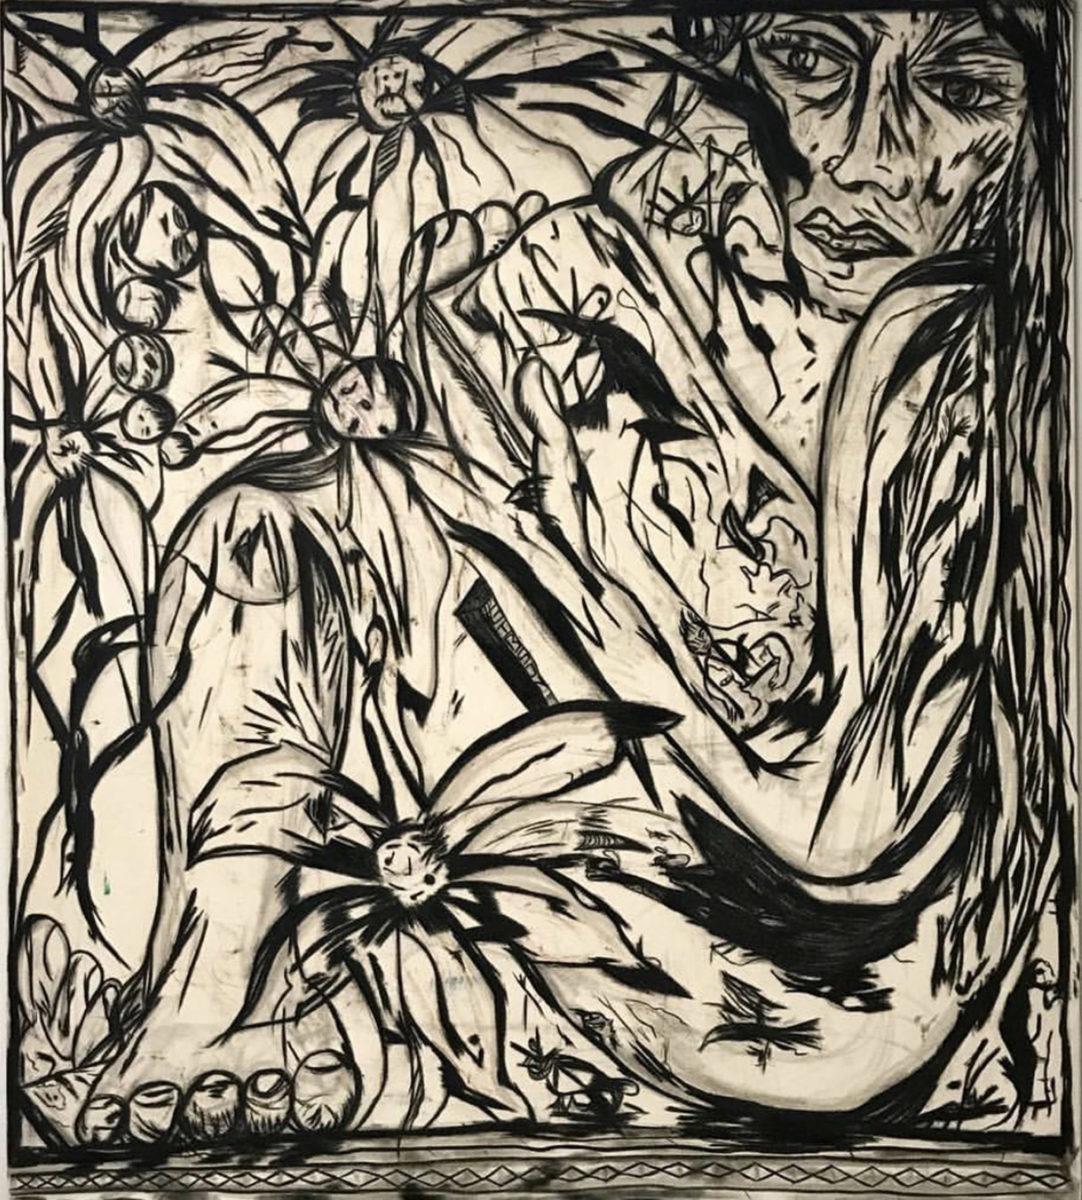 Daniel Gibson, Reading at Elyisan park, 2017, mixed media on canvas, 213×182 cm (2)